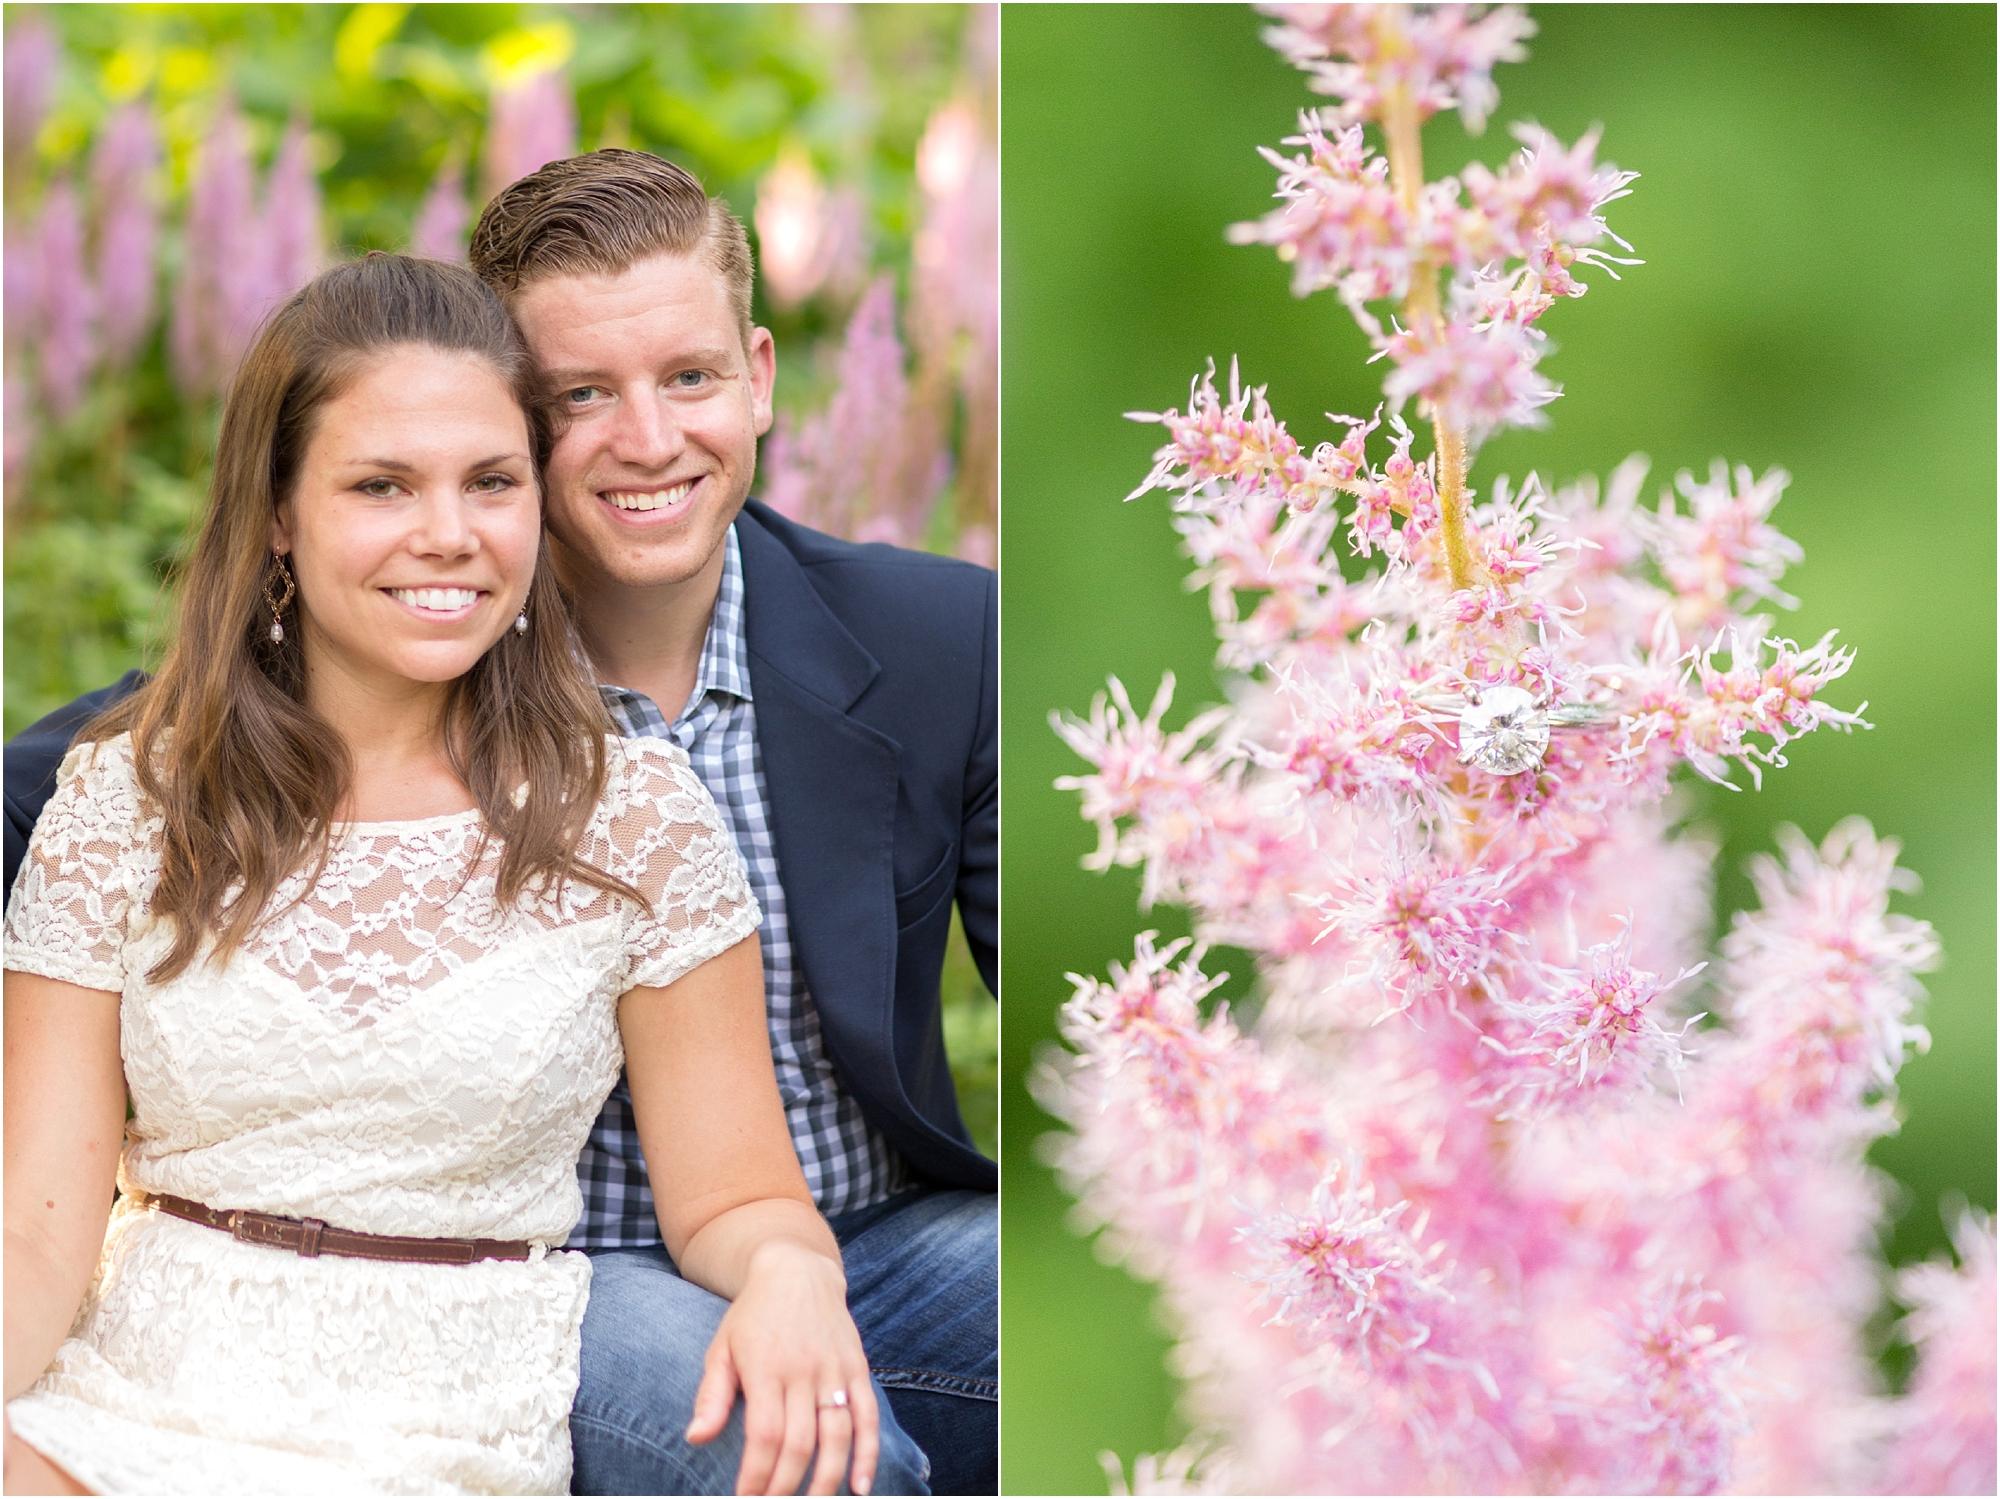 Clare & Nick Engagement-112_anna grace photography brookside gardens maryland engagement photographer photo.jpg